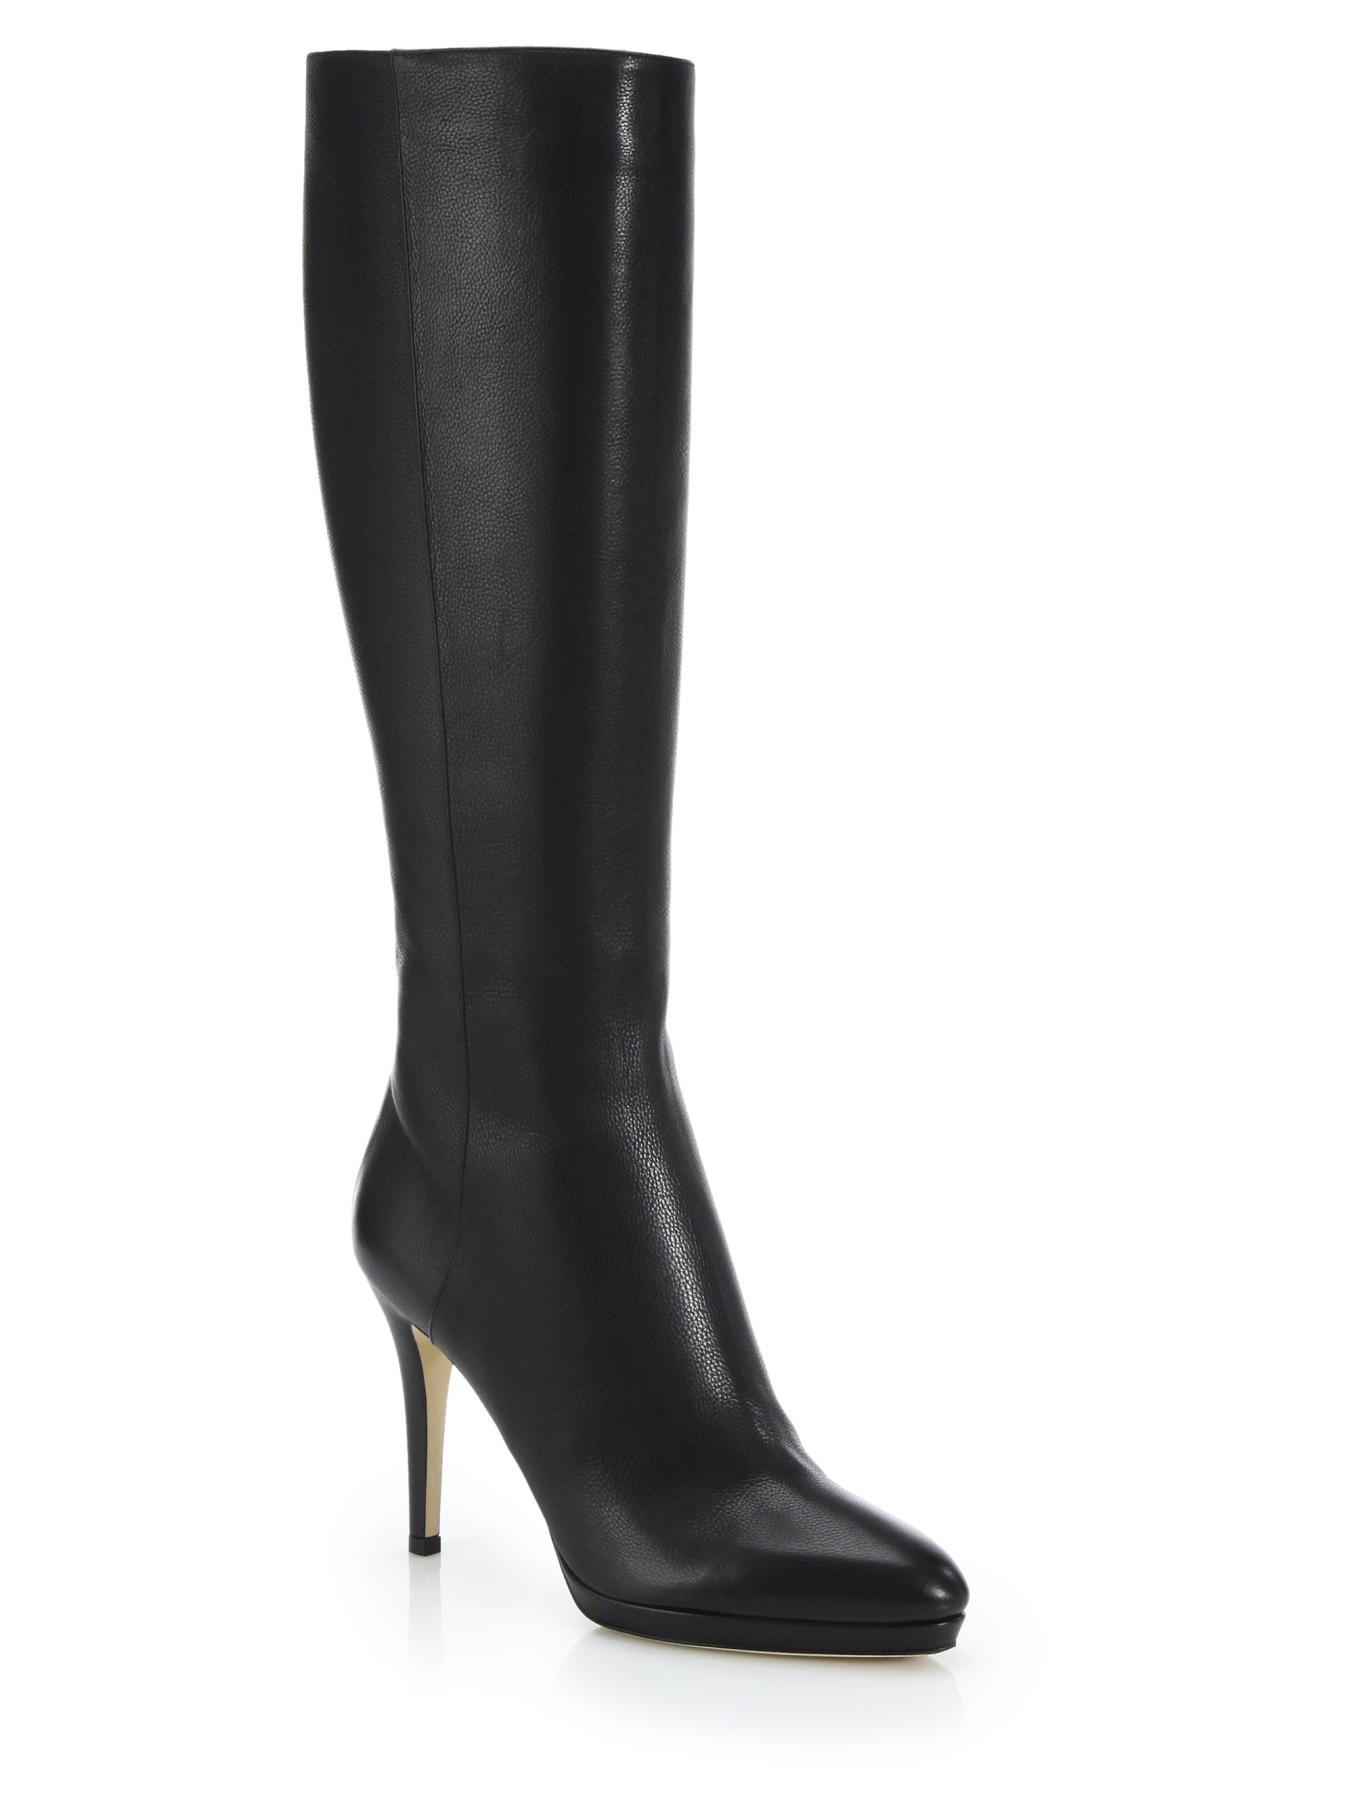 jimmy choo glynn leather knee high boots in black lyst